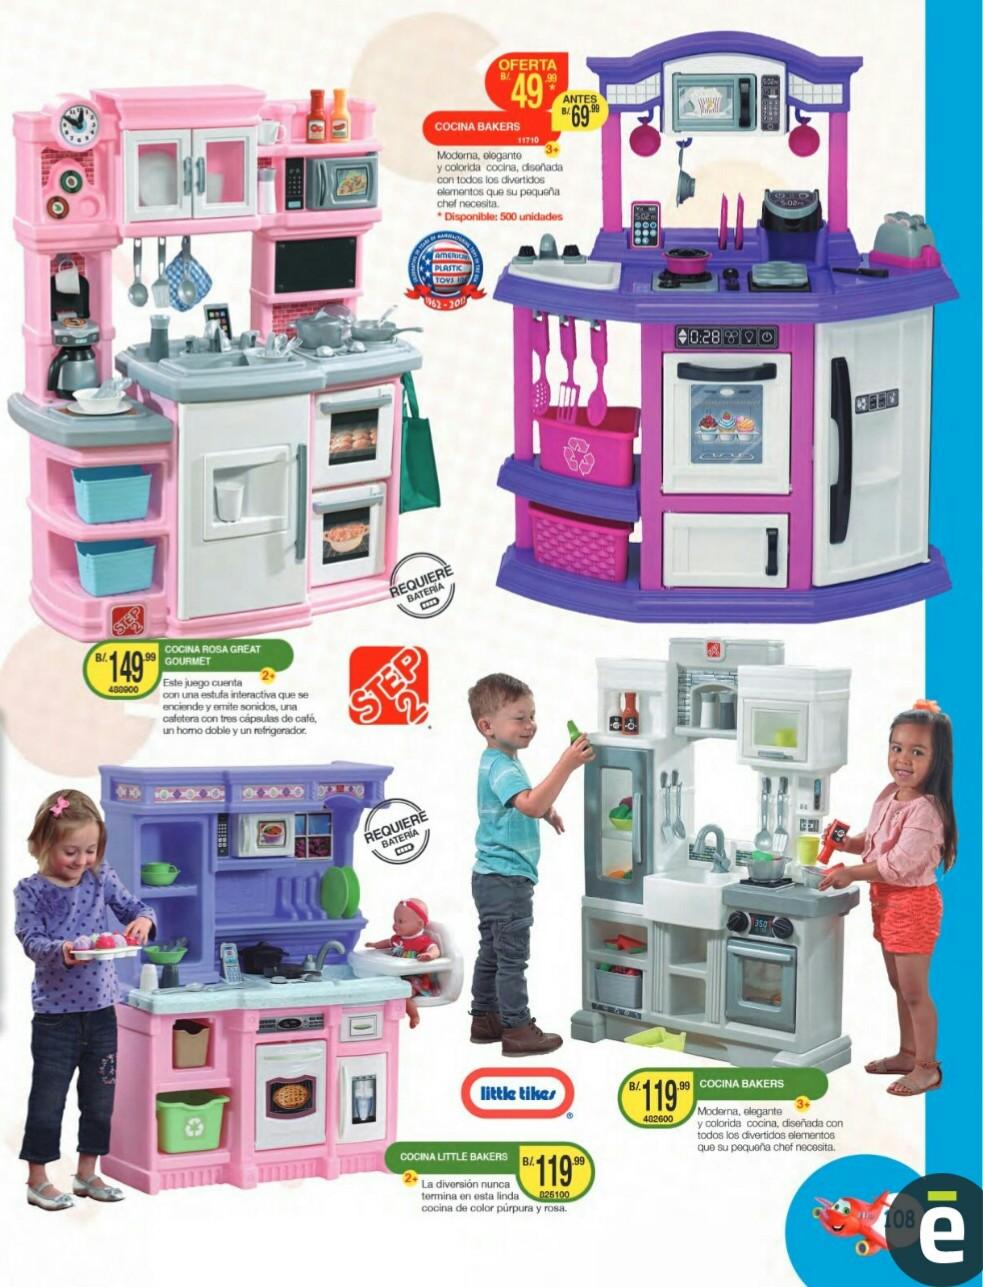 Catalogo juguetes Titan Toys 2019 p108